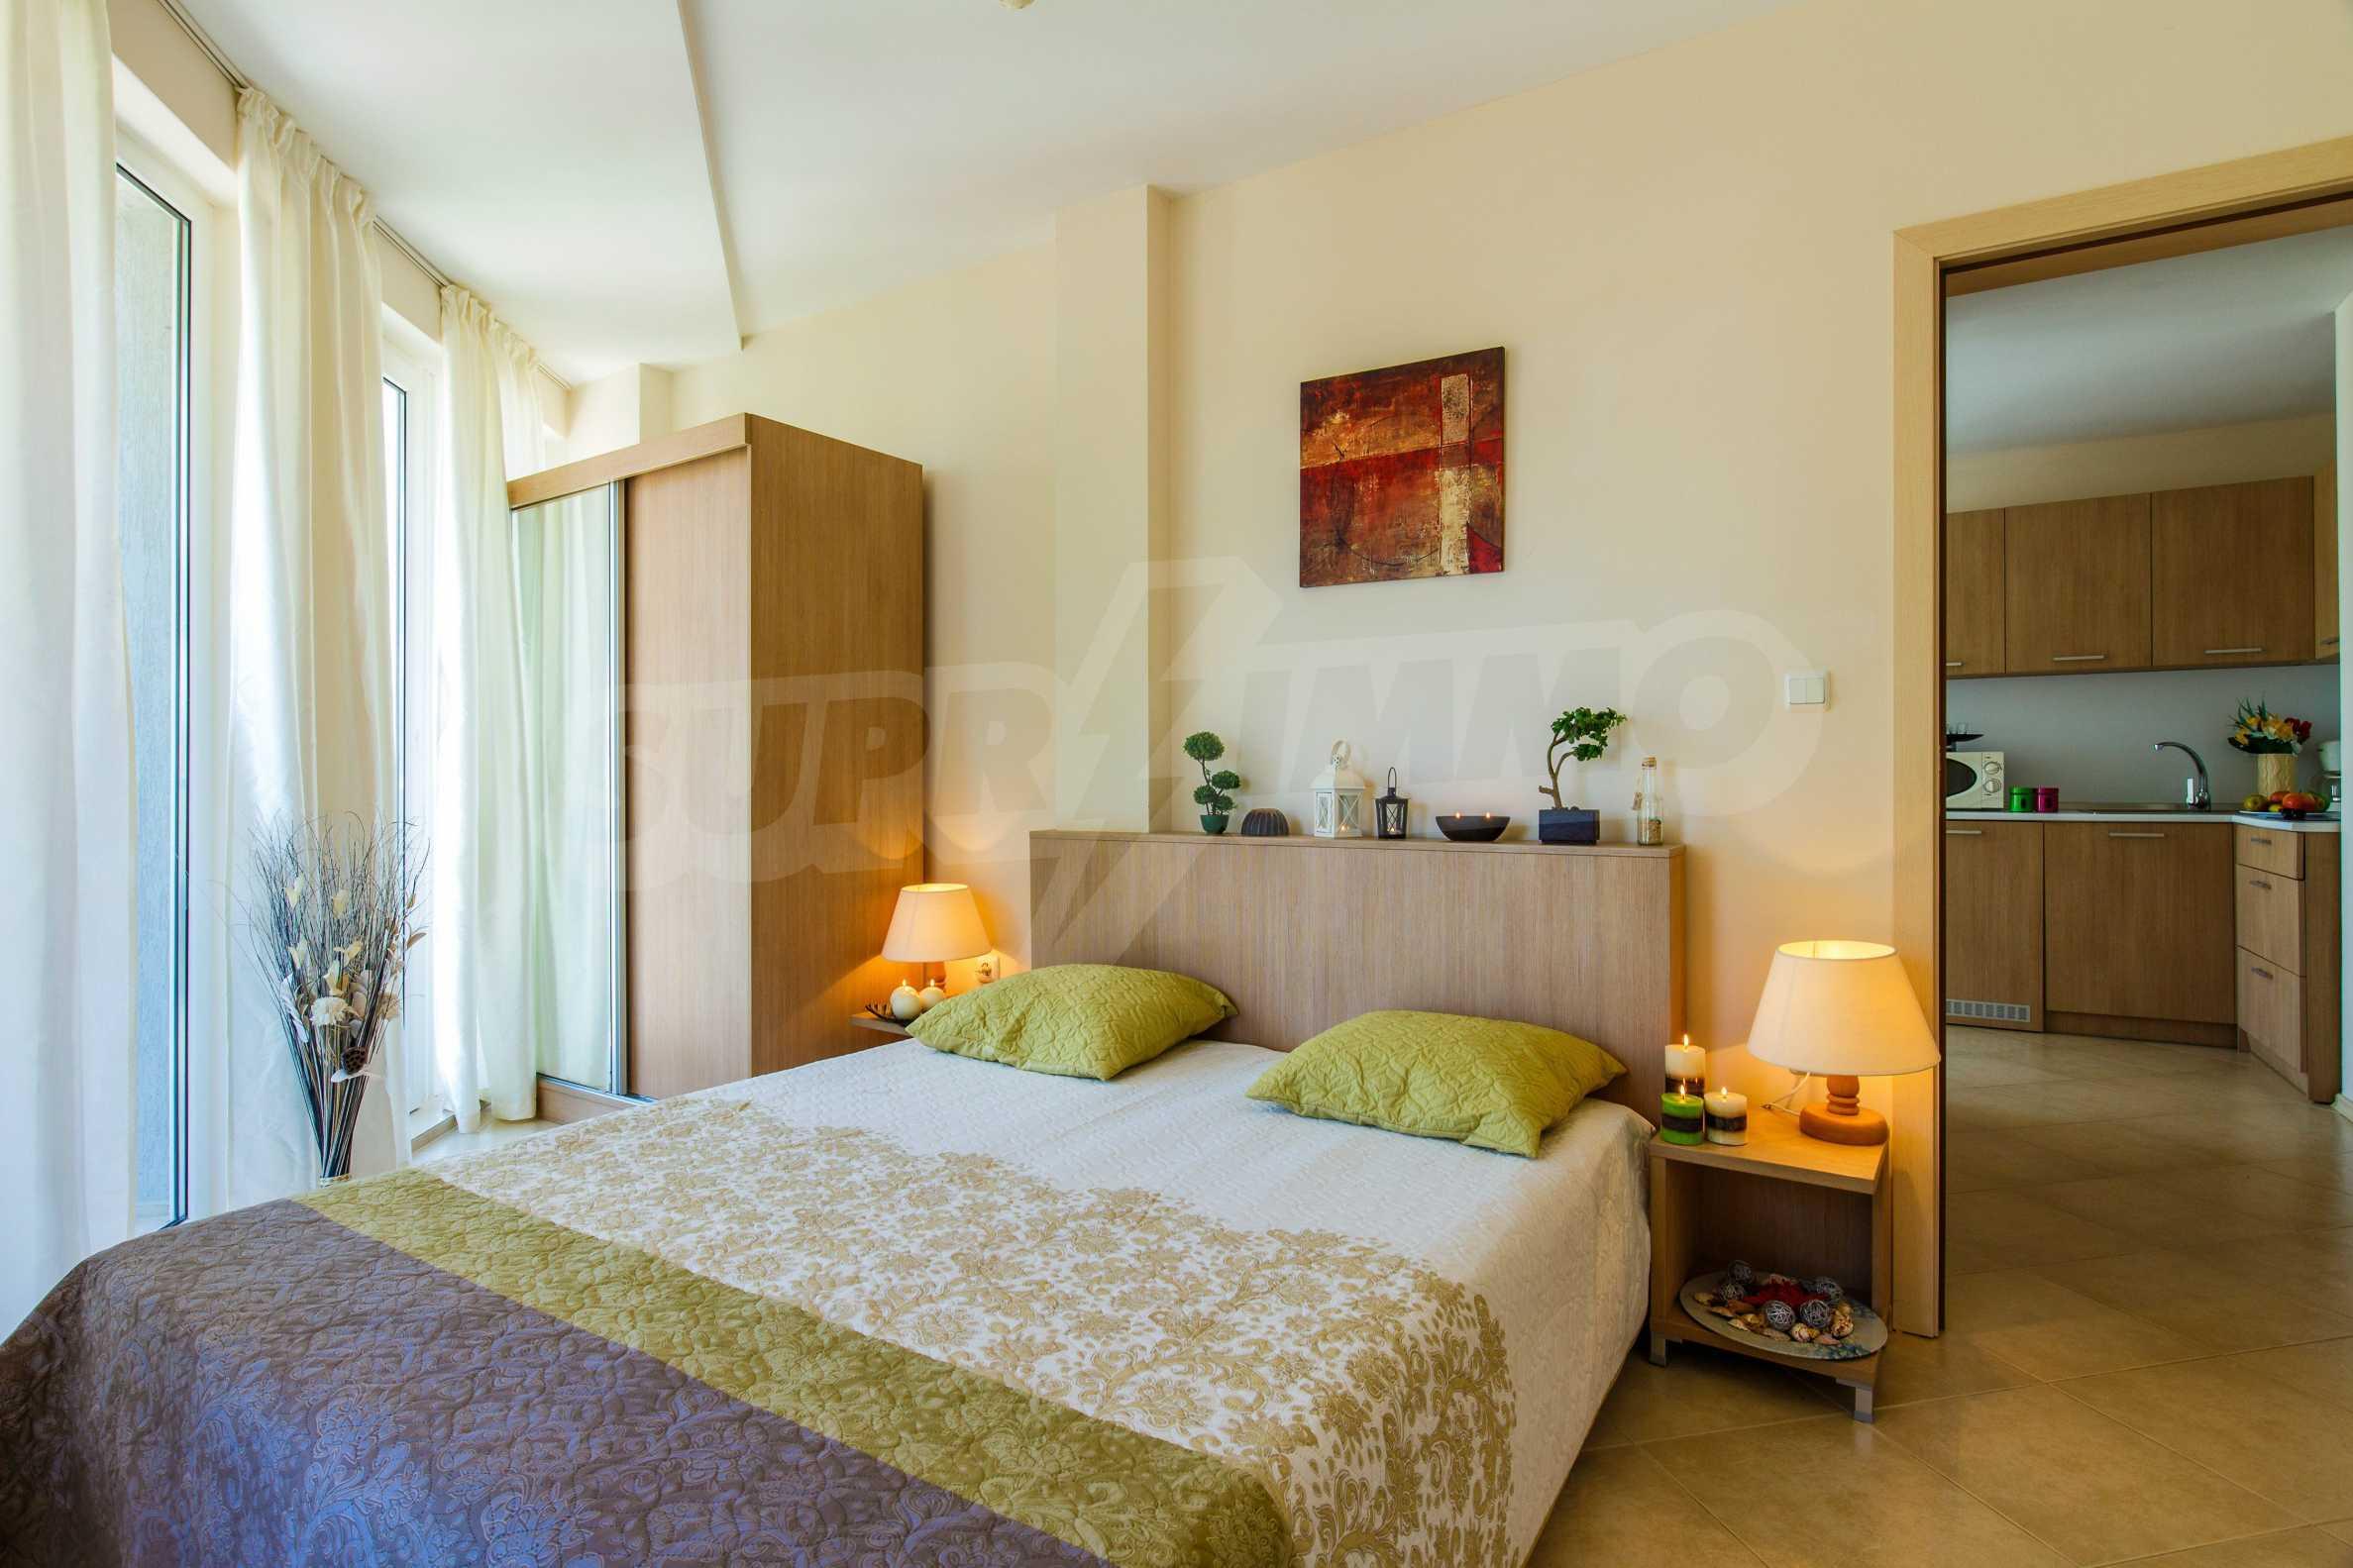 Тристаен апартамент в комплекс Емберли близо до плажа в Лозенец (ап. №423) 16